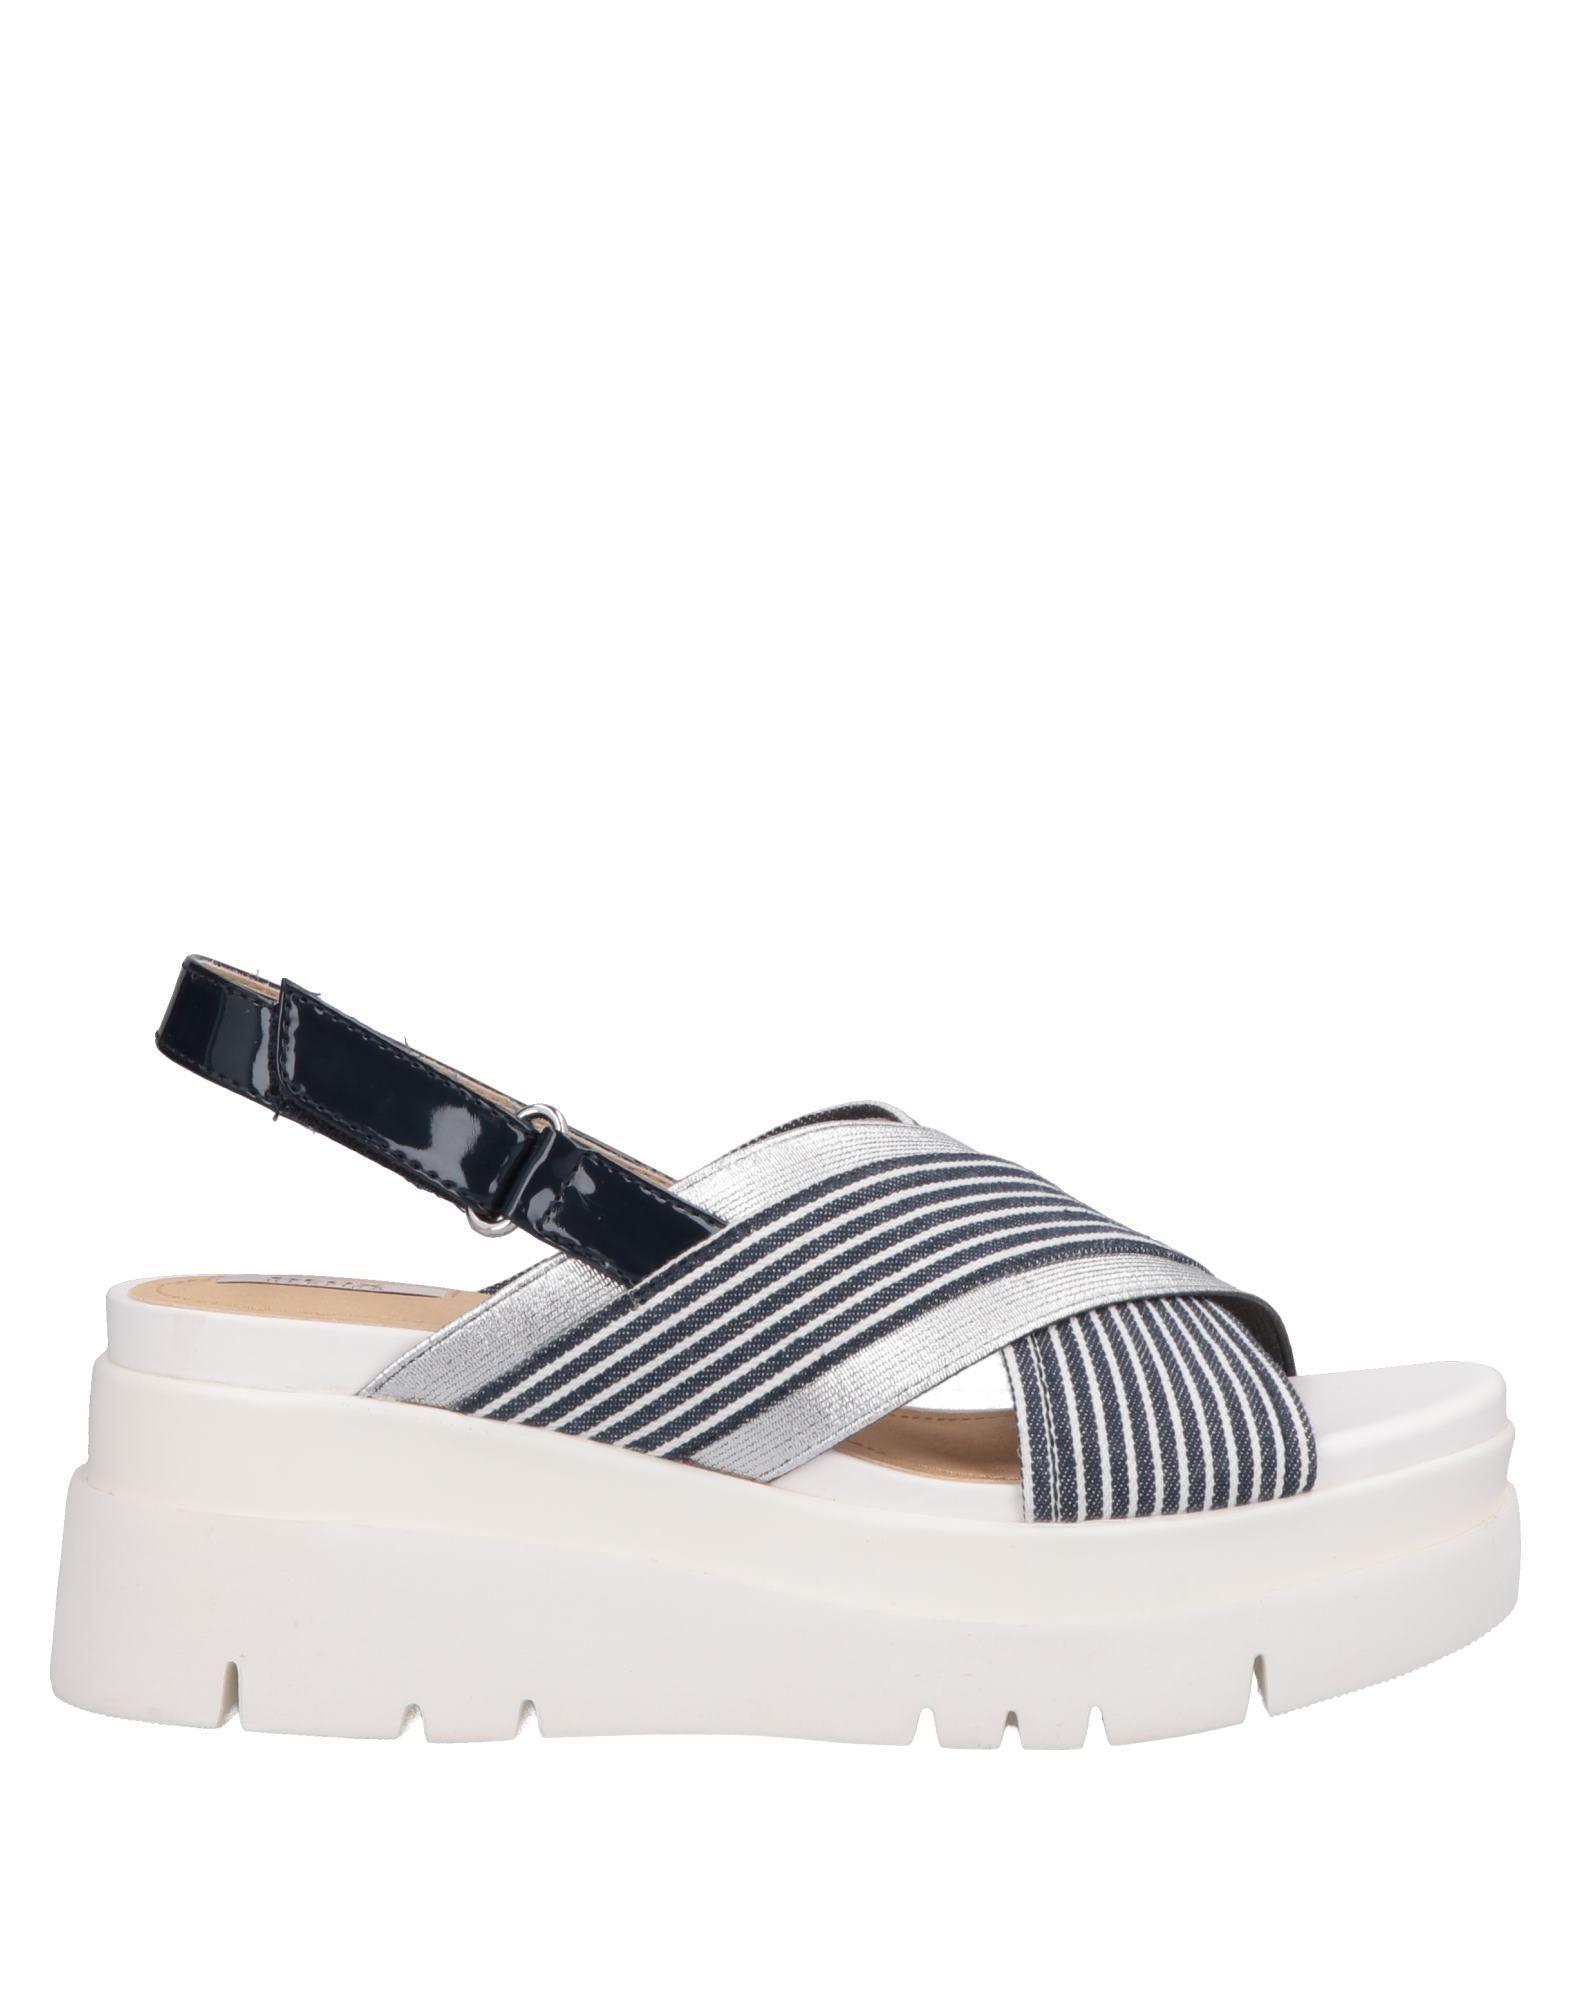 901a81faa6a Lyst - Geox Sandals in Blue